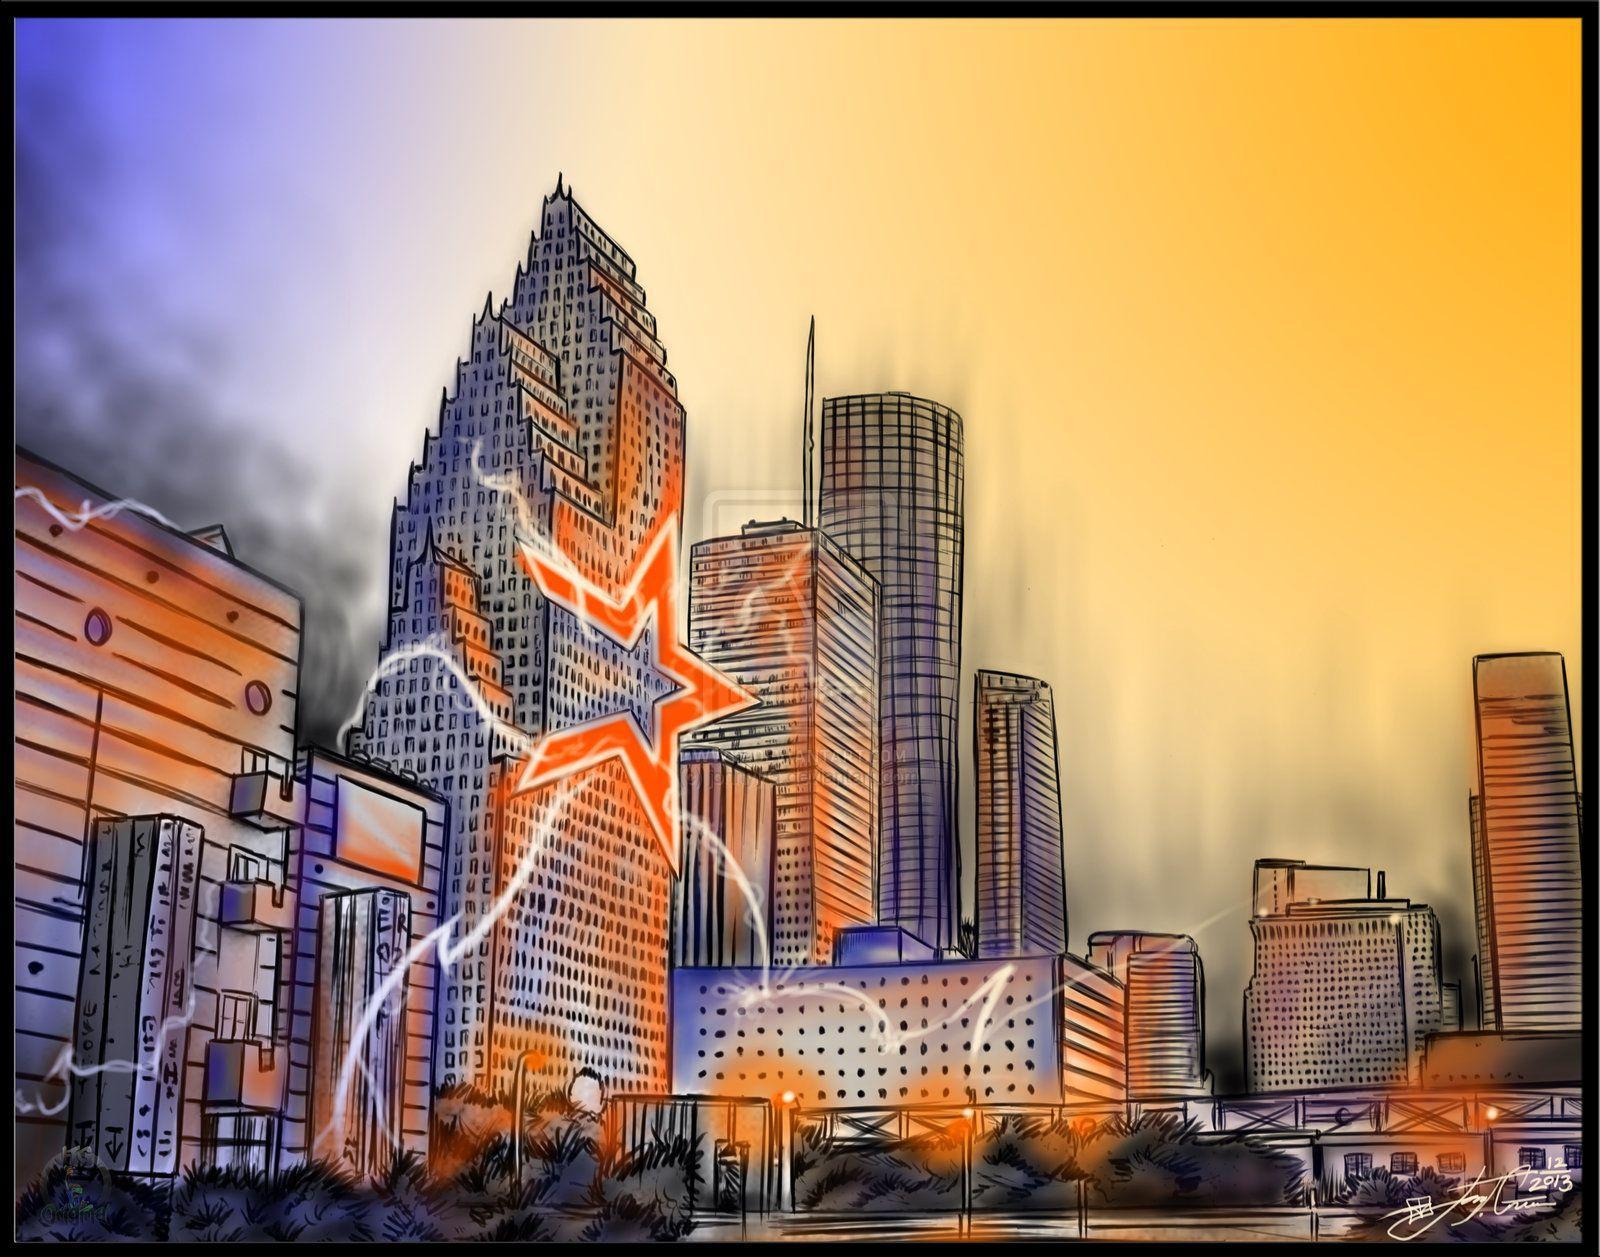 Houston Astros IPhone Wallpaper